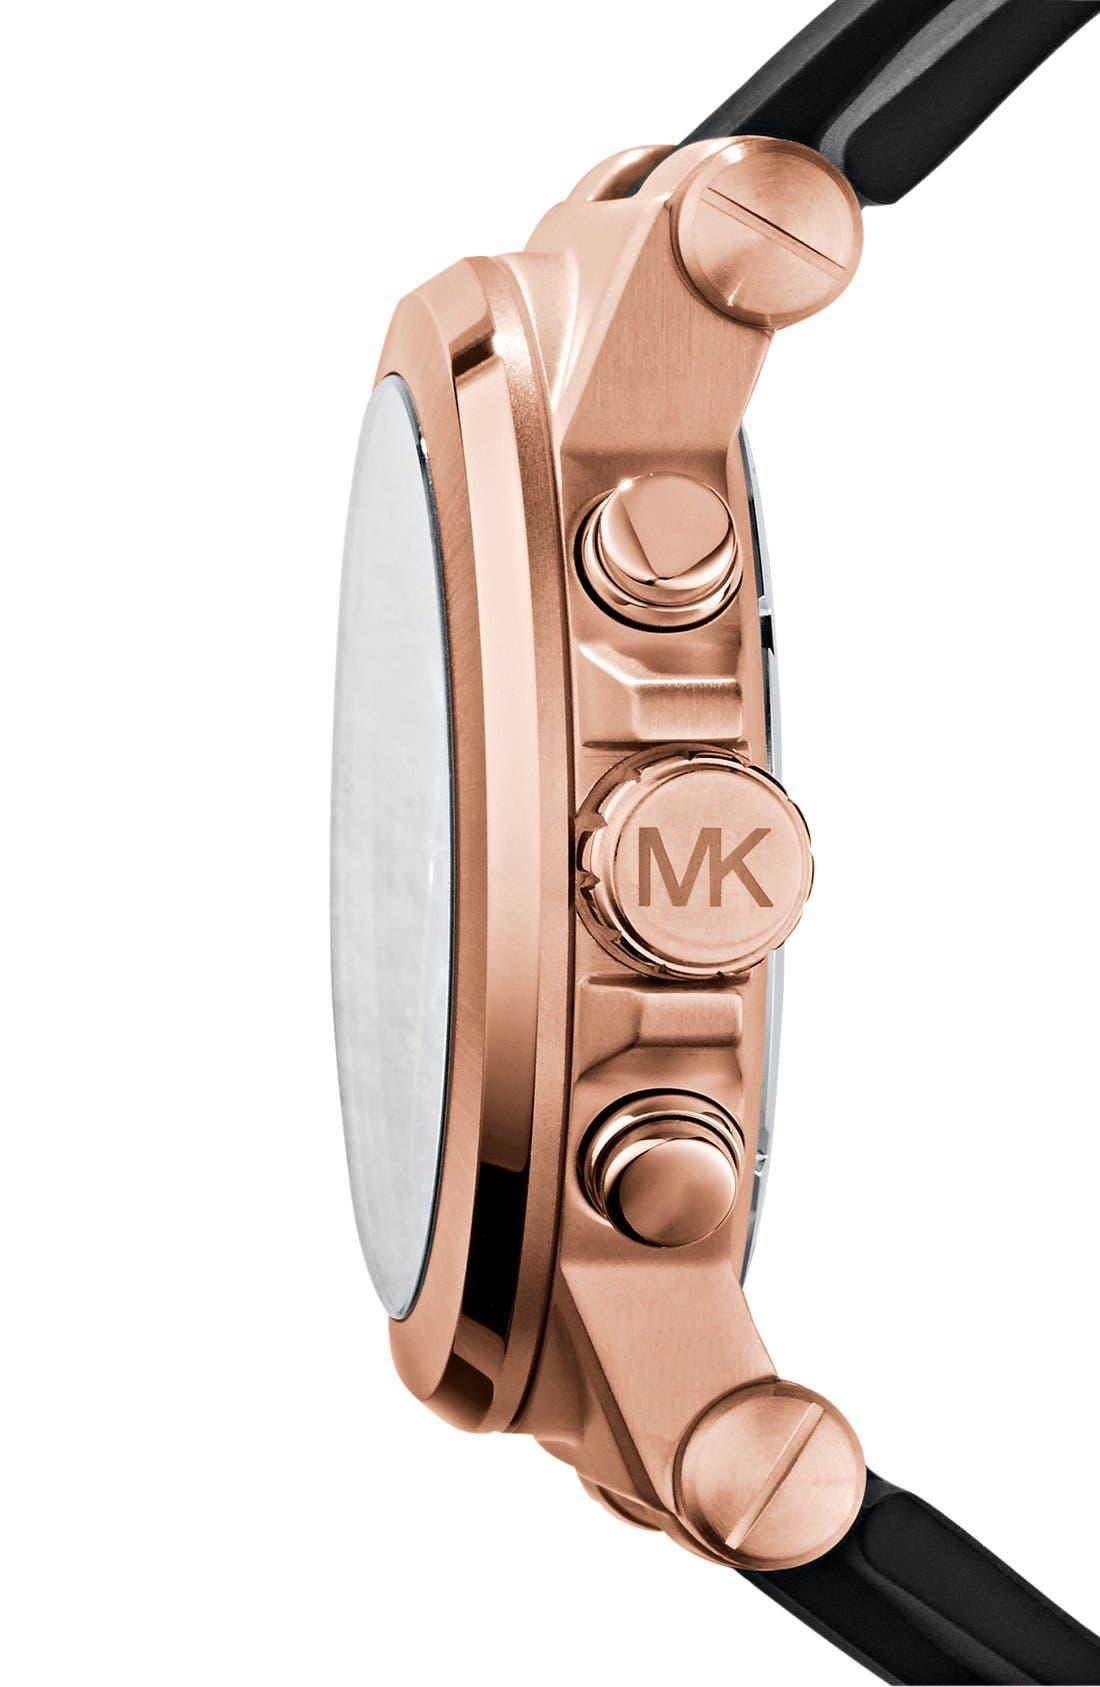 MICHAEL KORS, Chronograph Watch, 45mm, Alternate thumbnail 3, color, ROSE GOLD/ BLACK